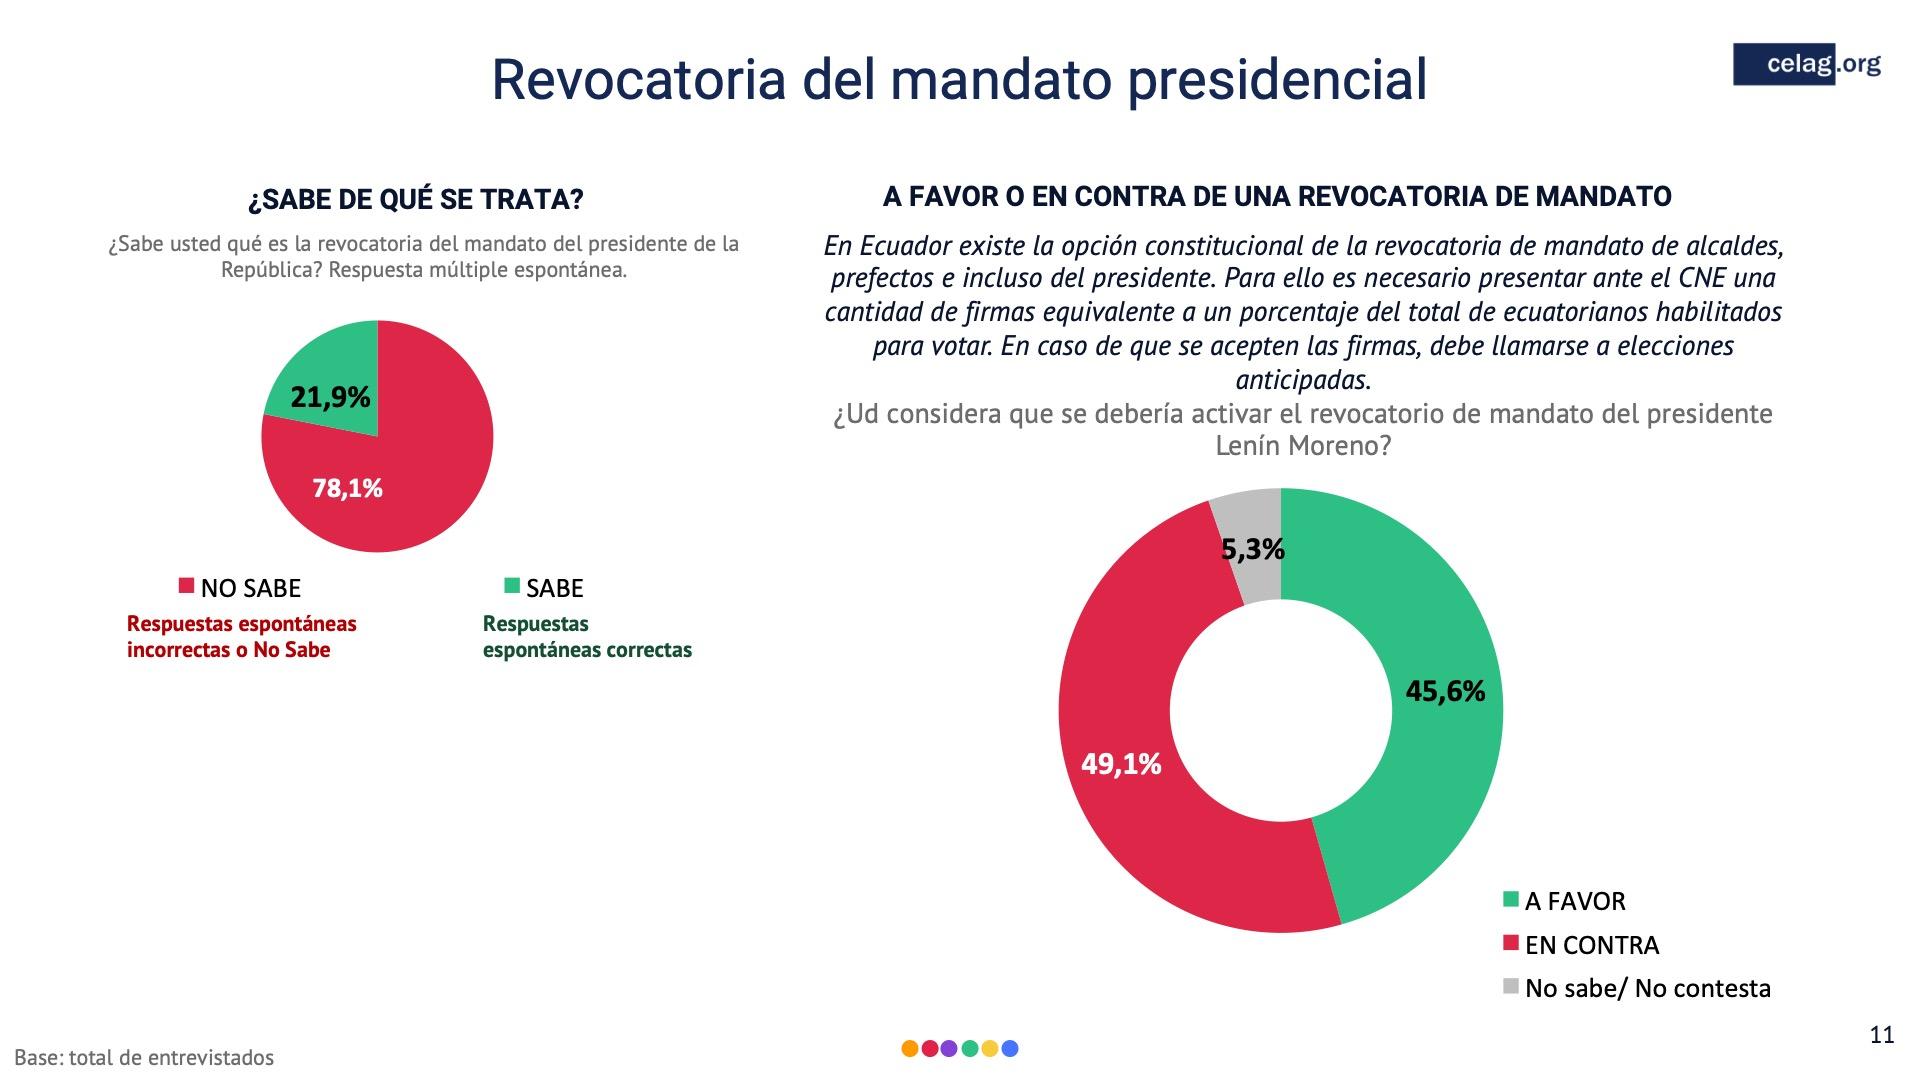 11 Revocatoria del mandato presidencial ecuador